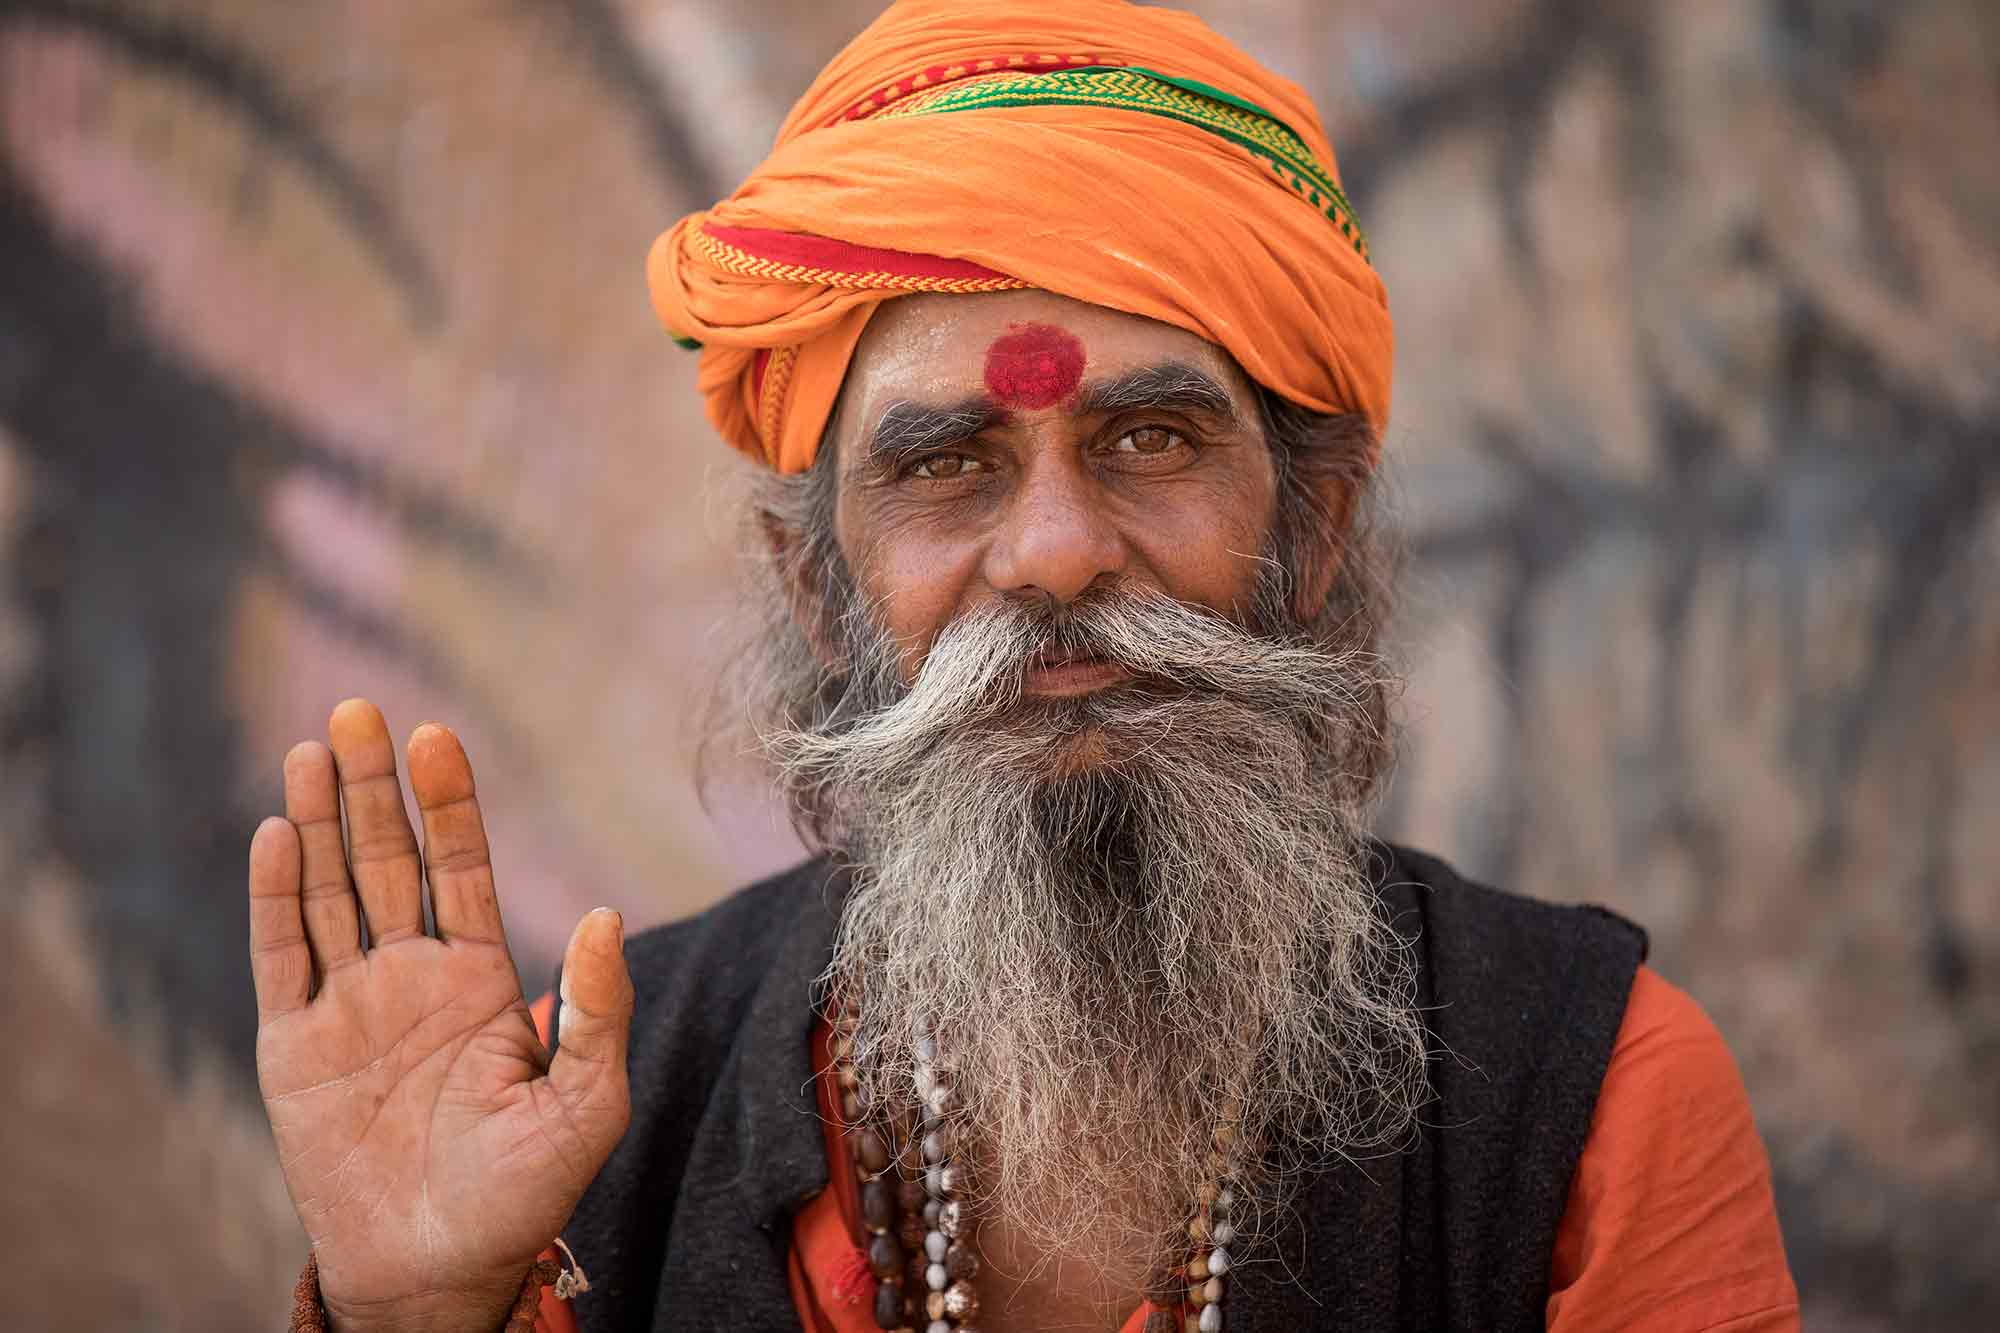 sadhu-varanasi-india-2